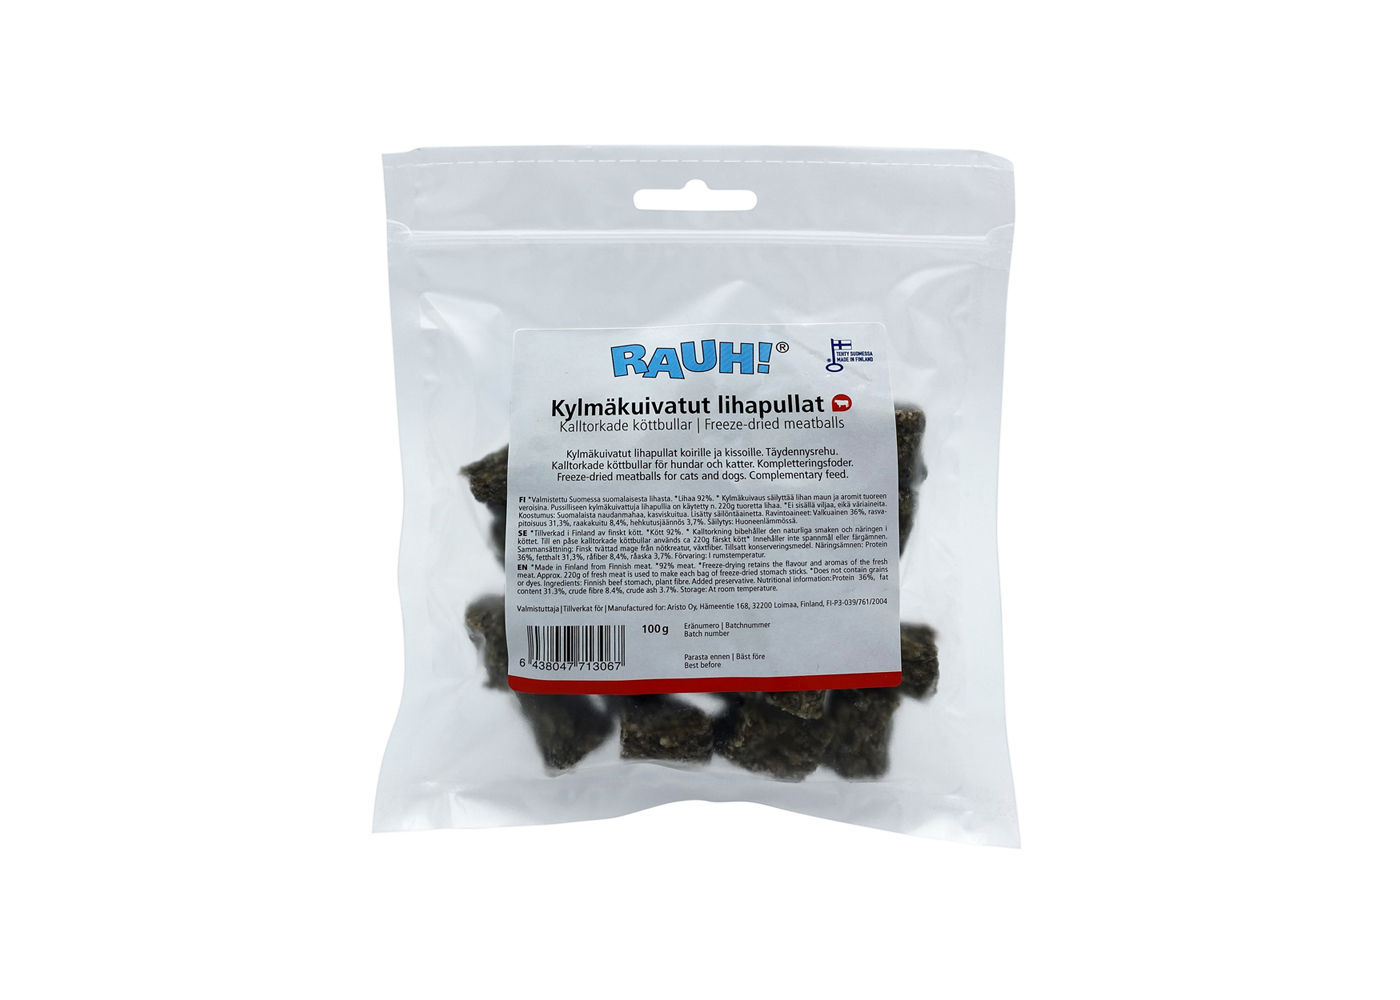 RAUH Freeze-dried Meatballs 100 g